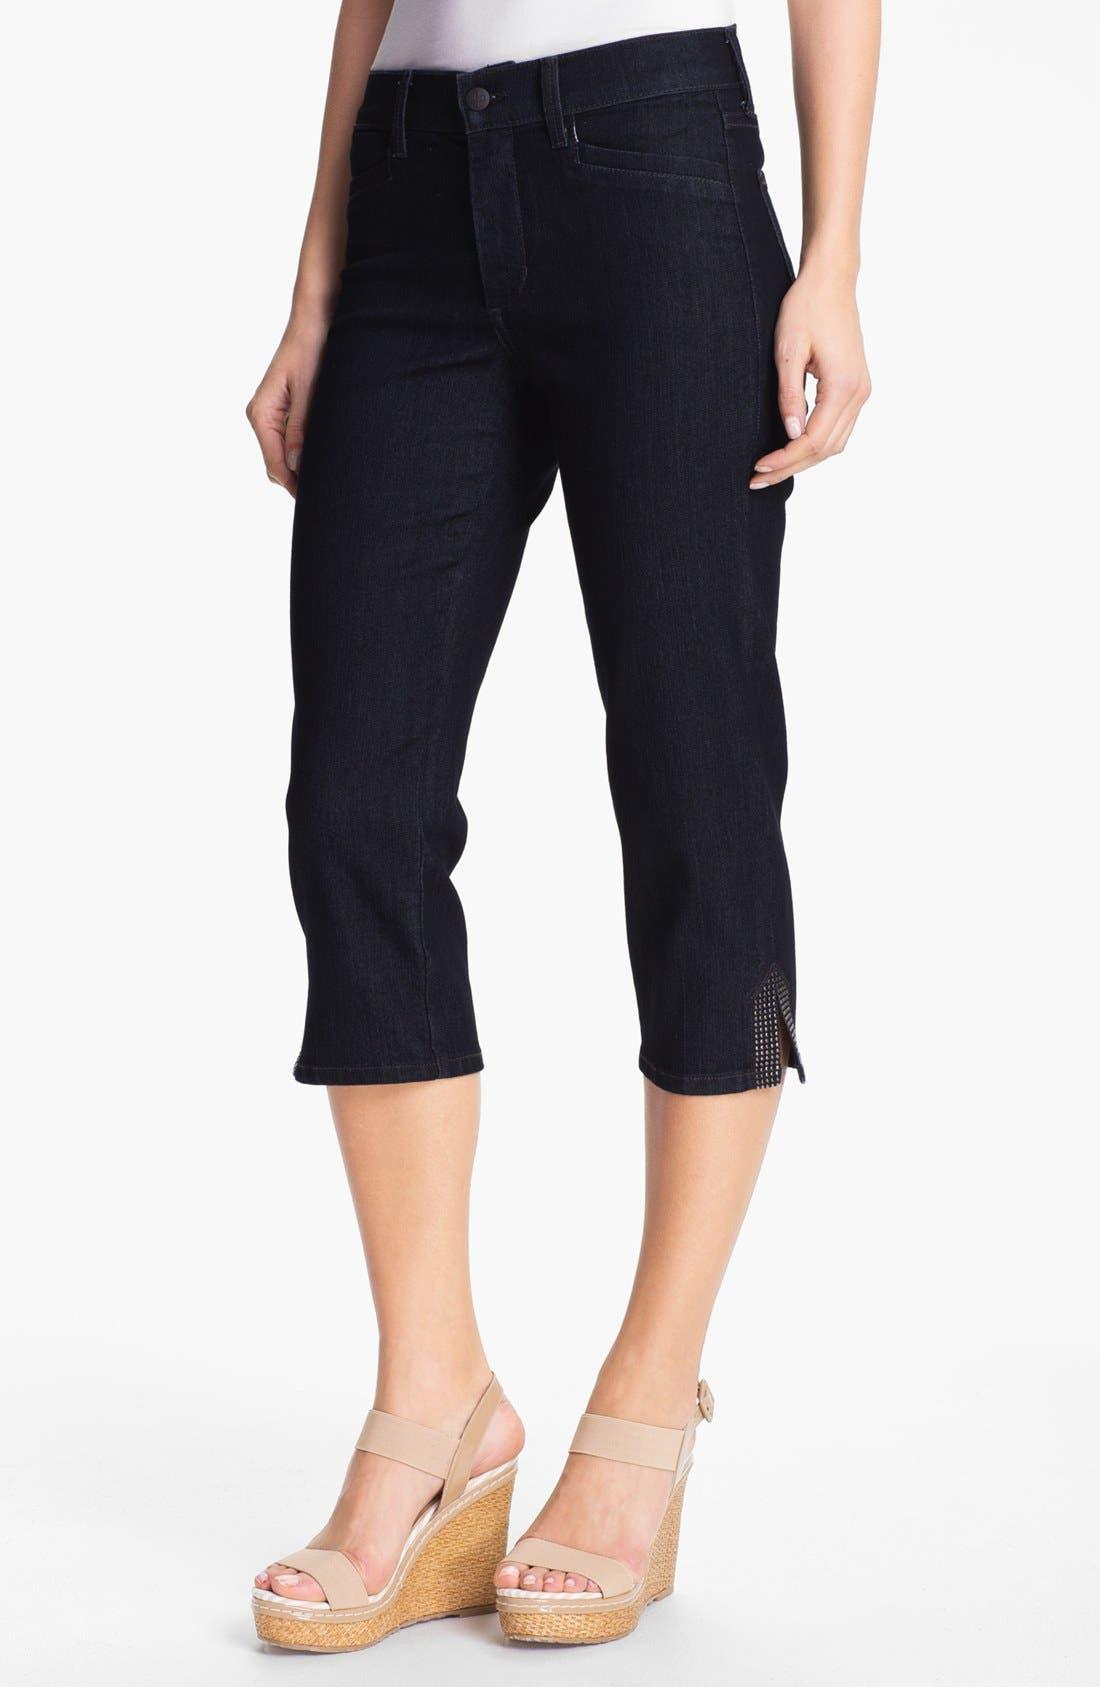 Main Image - NYDJ 'Suzy' Embellished Crop Jeans (Plus Size)